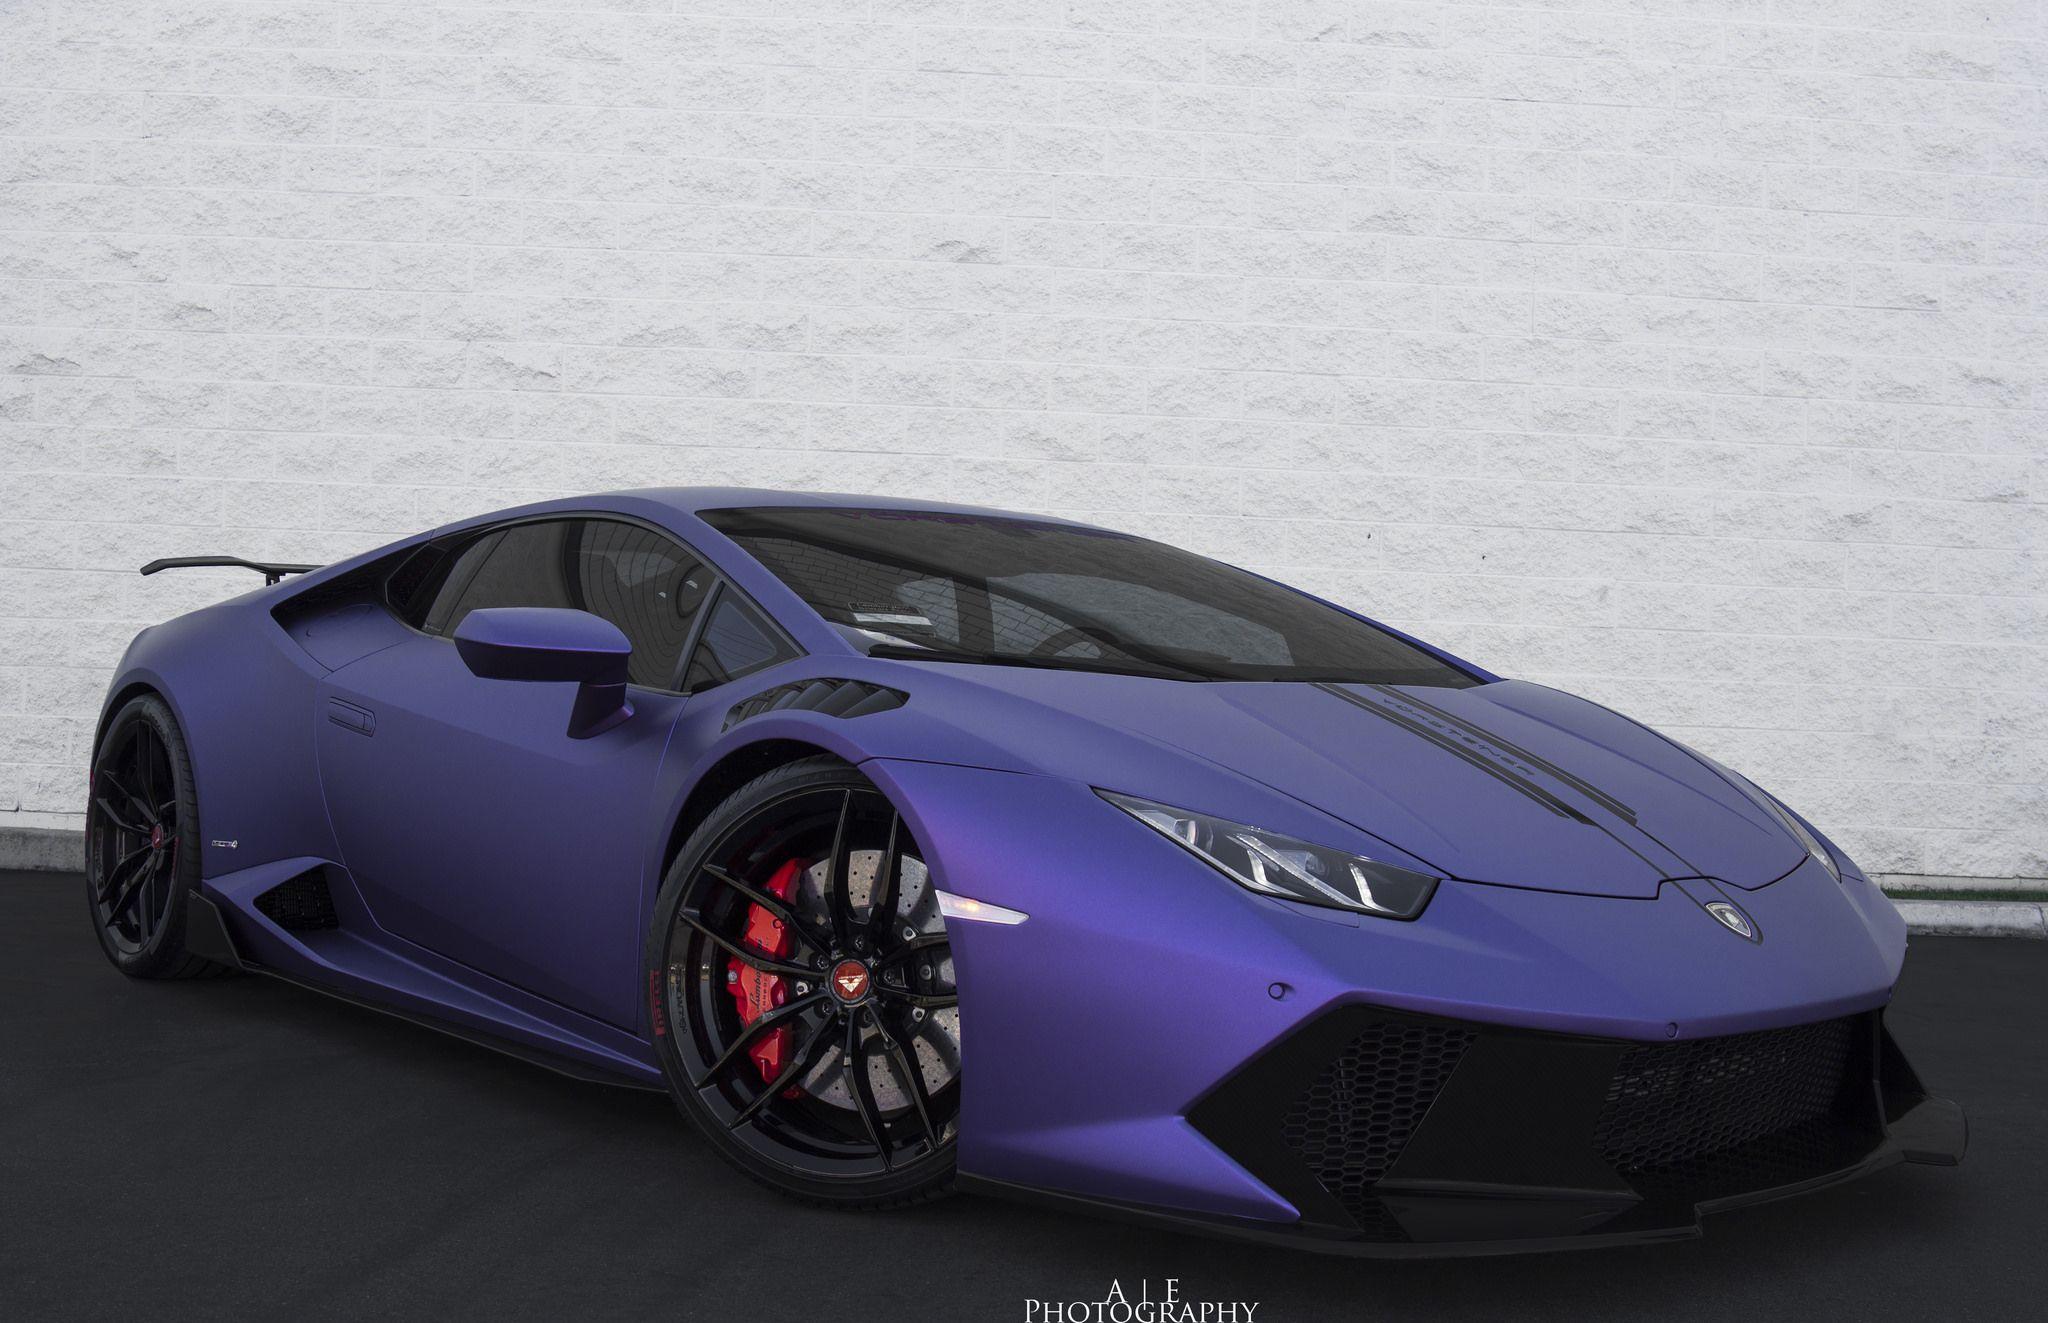 Merveilleux Purple Vorsteiner Lamborghini Huracan Novara Front Side View U2013 Nov 14, 15